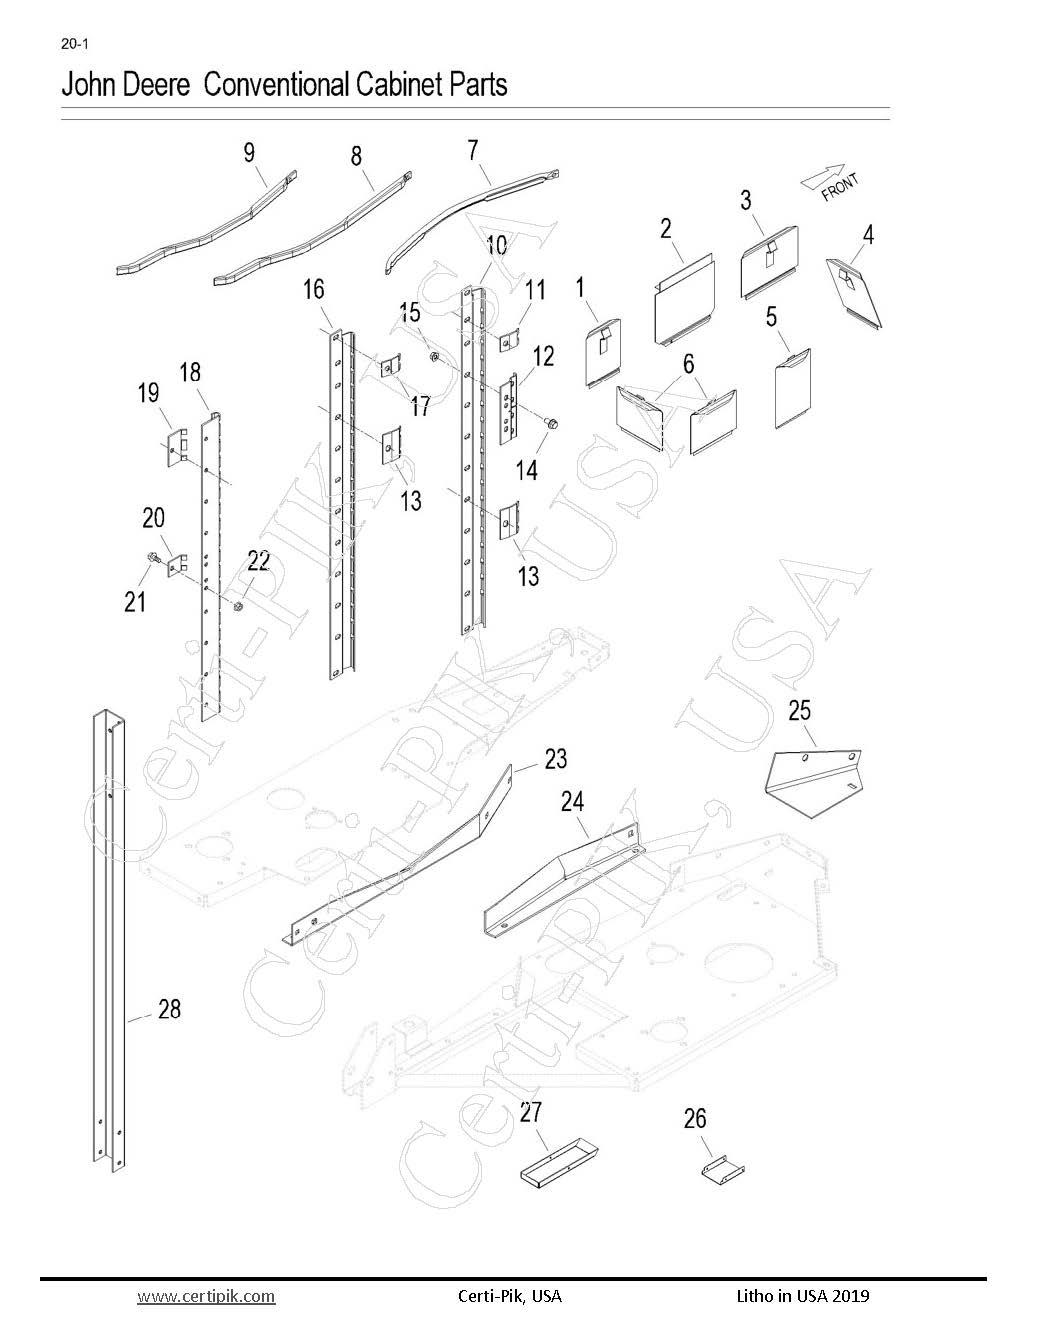 John Deere Conventional, Cabinet Parts